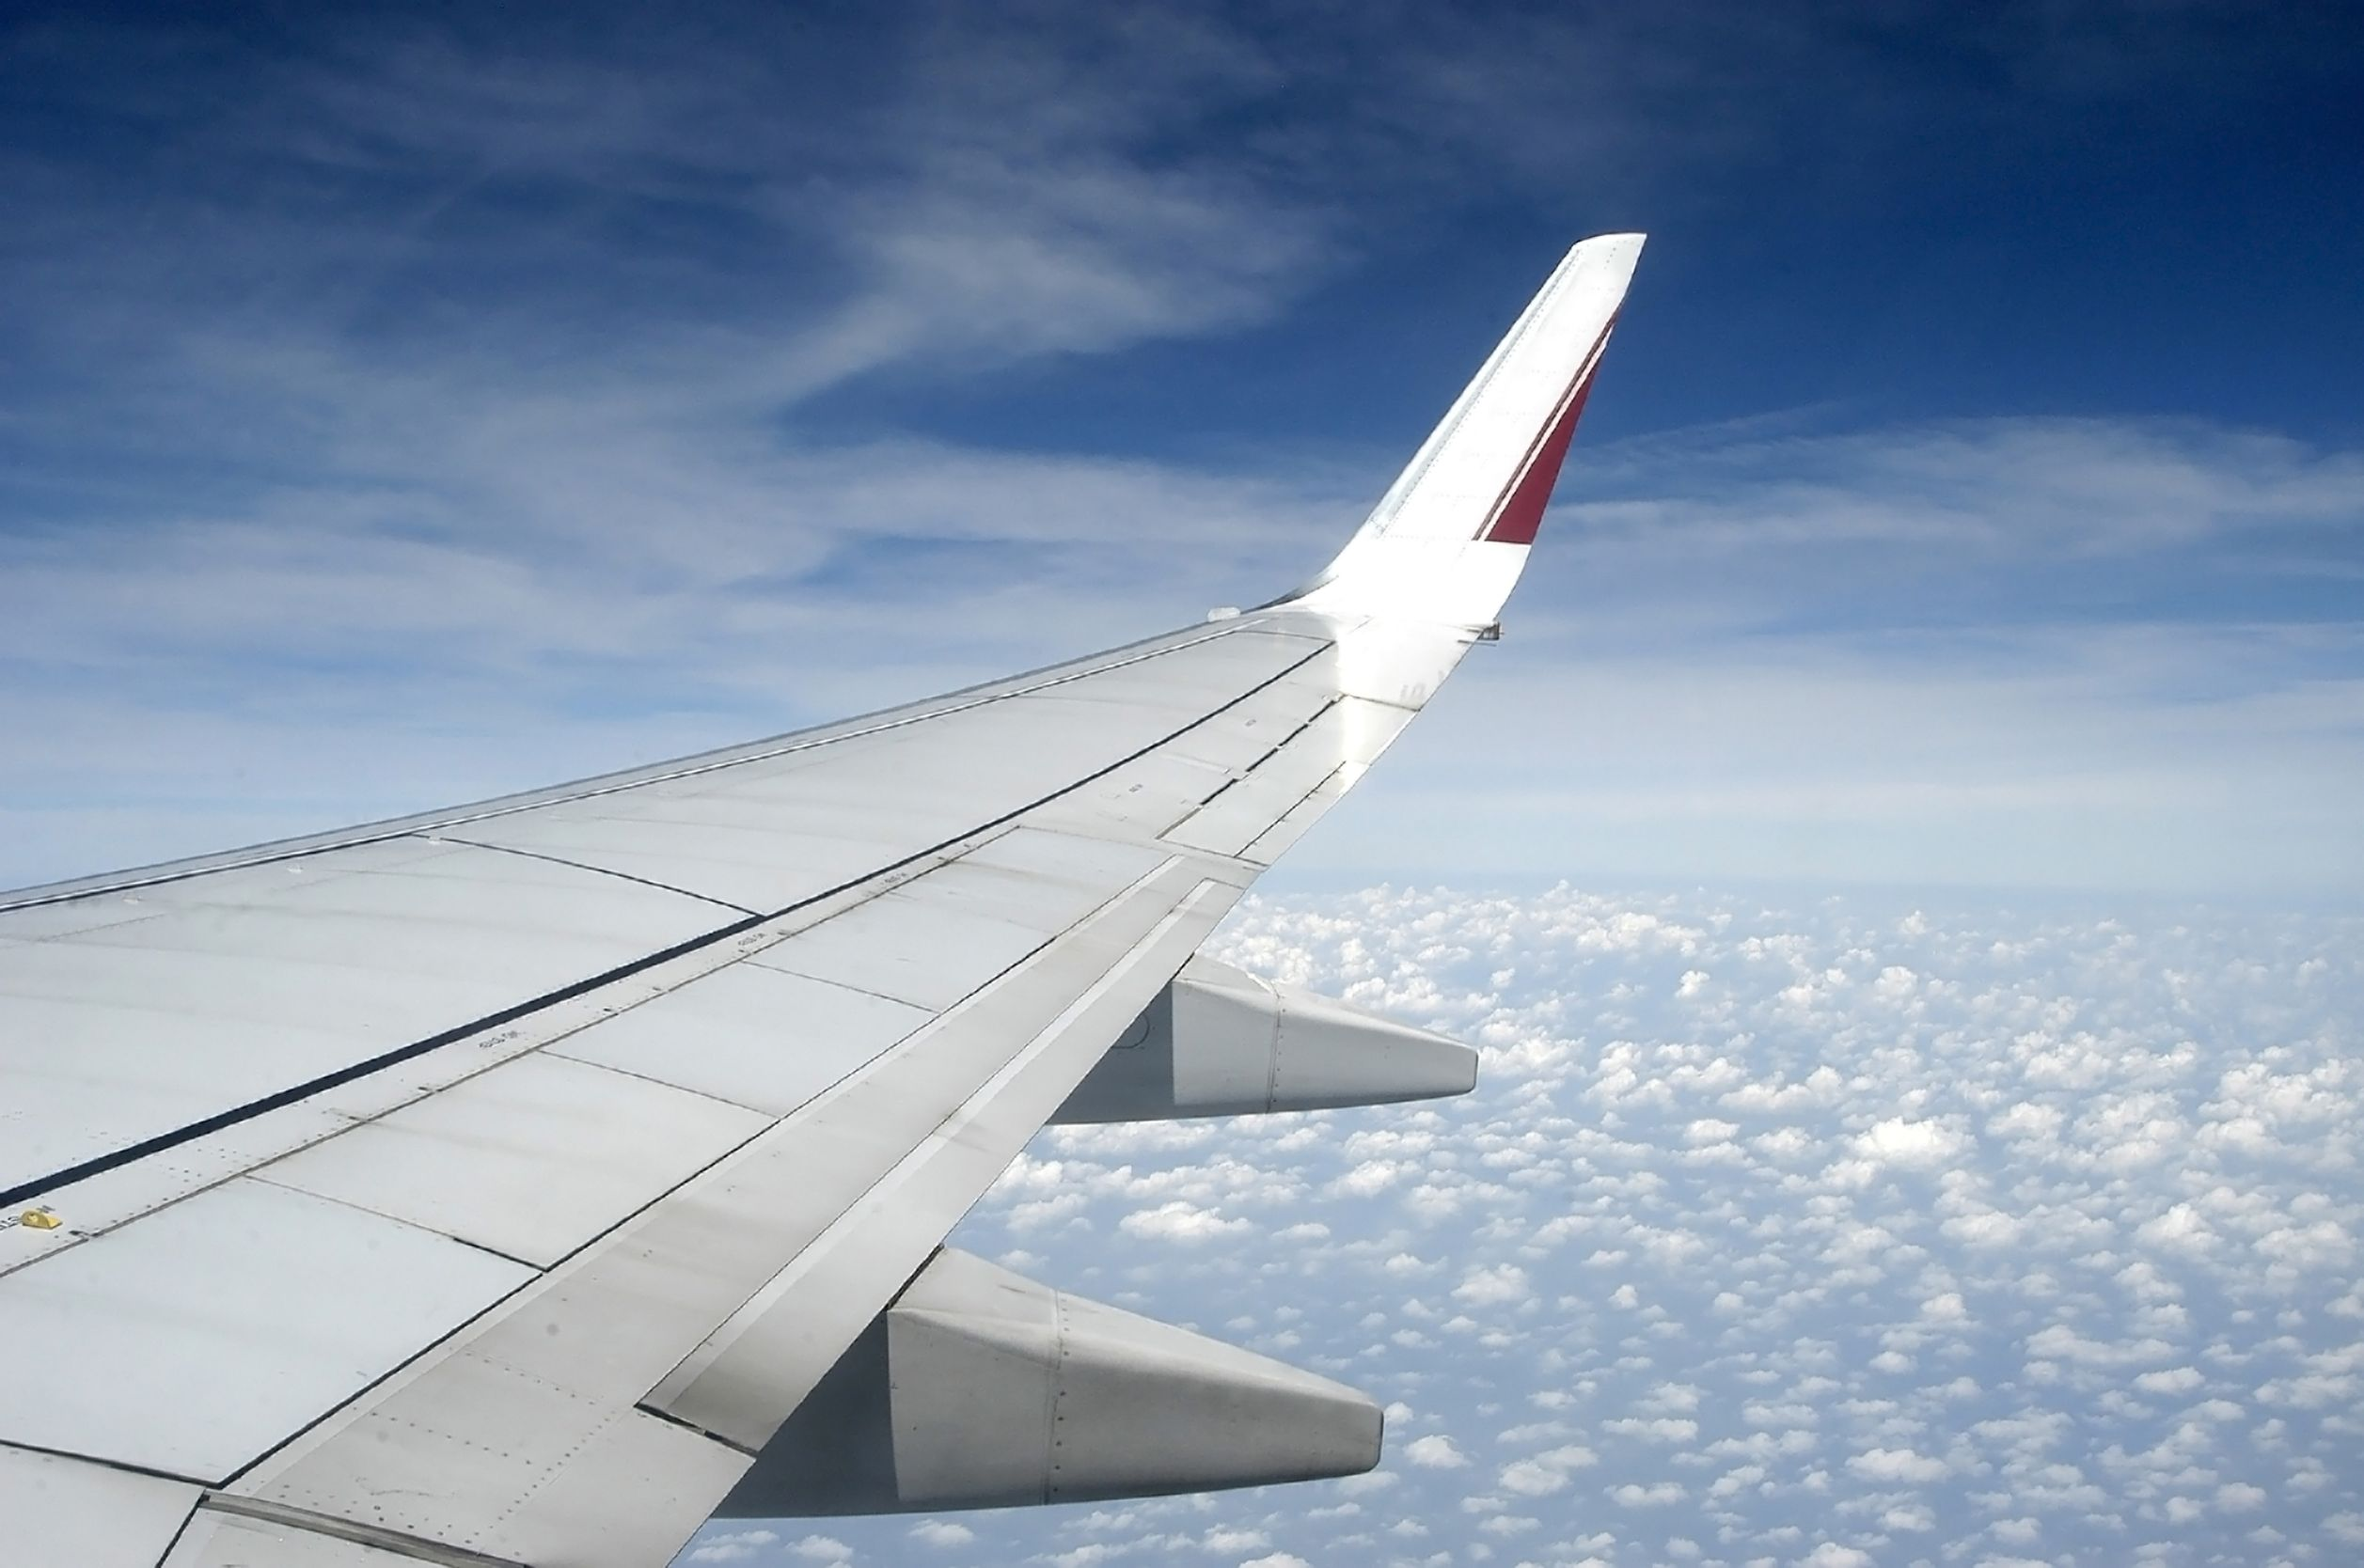 plane-wing-new-zealand